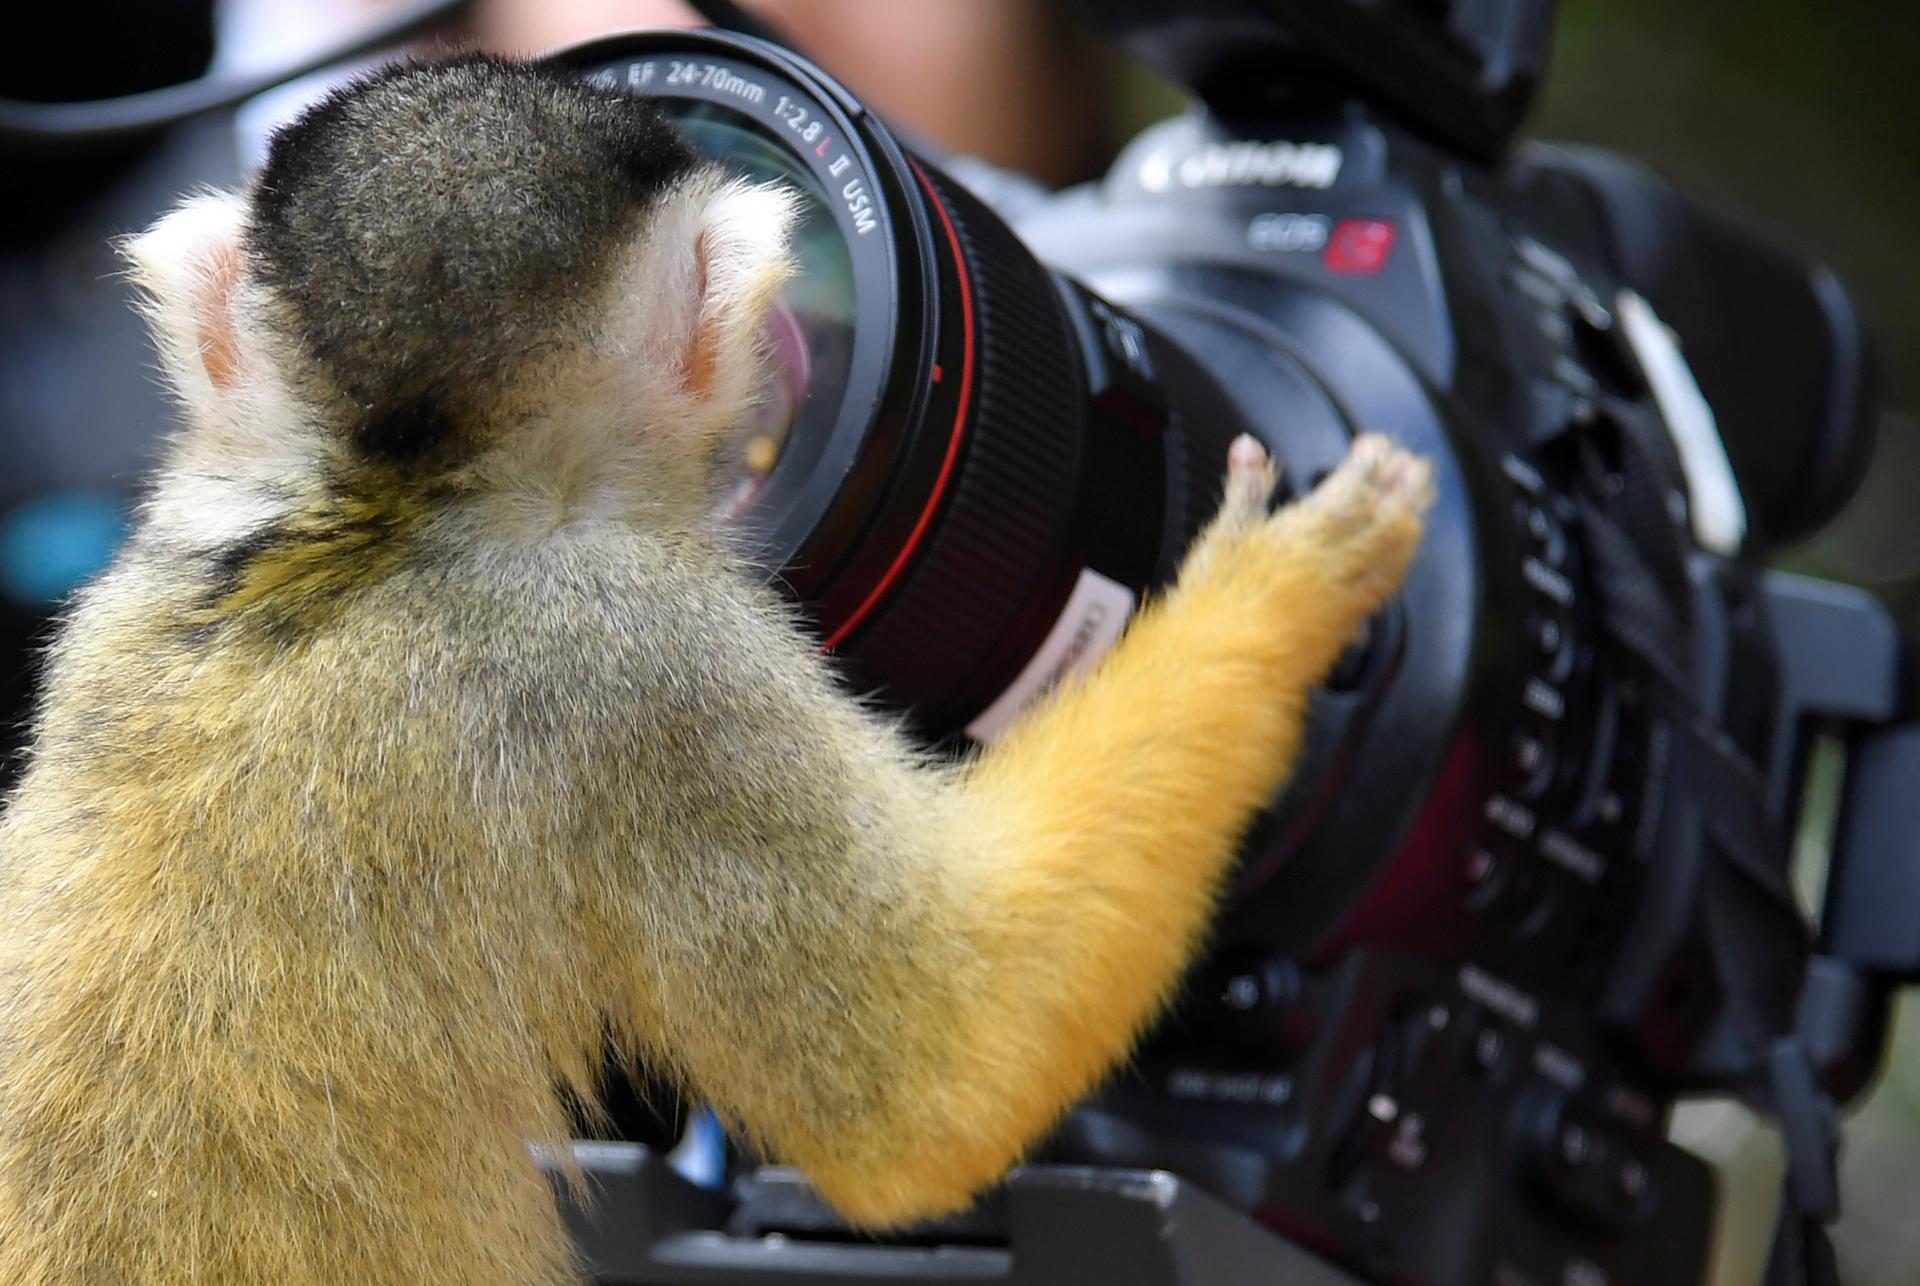 Фотографа заказывали?